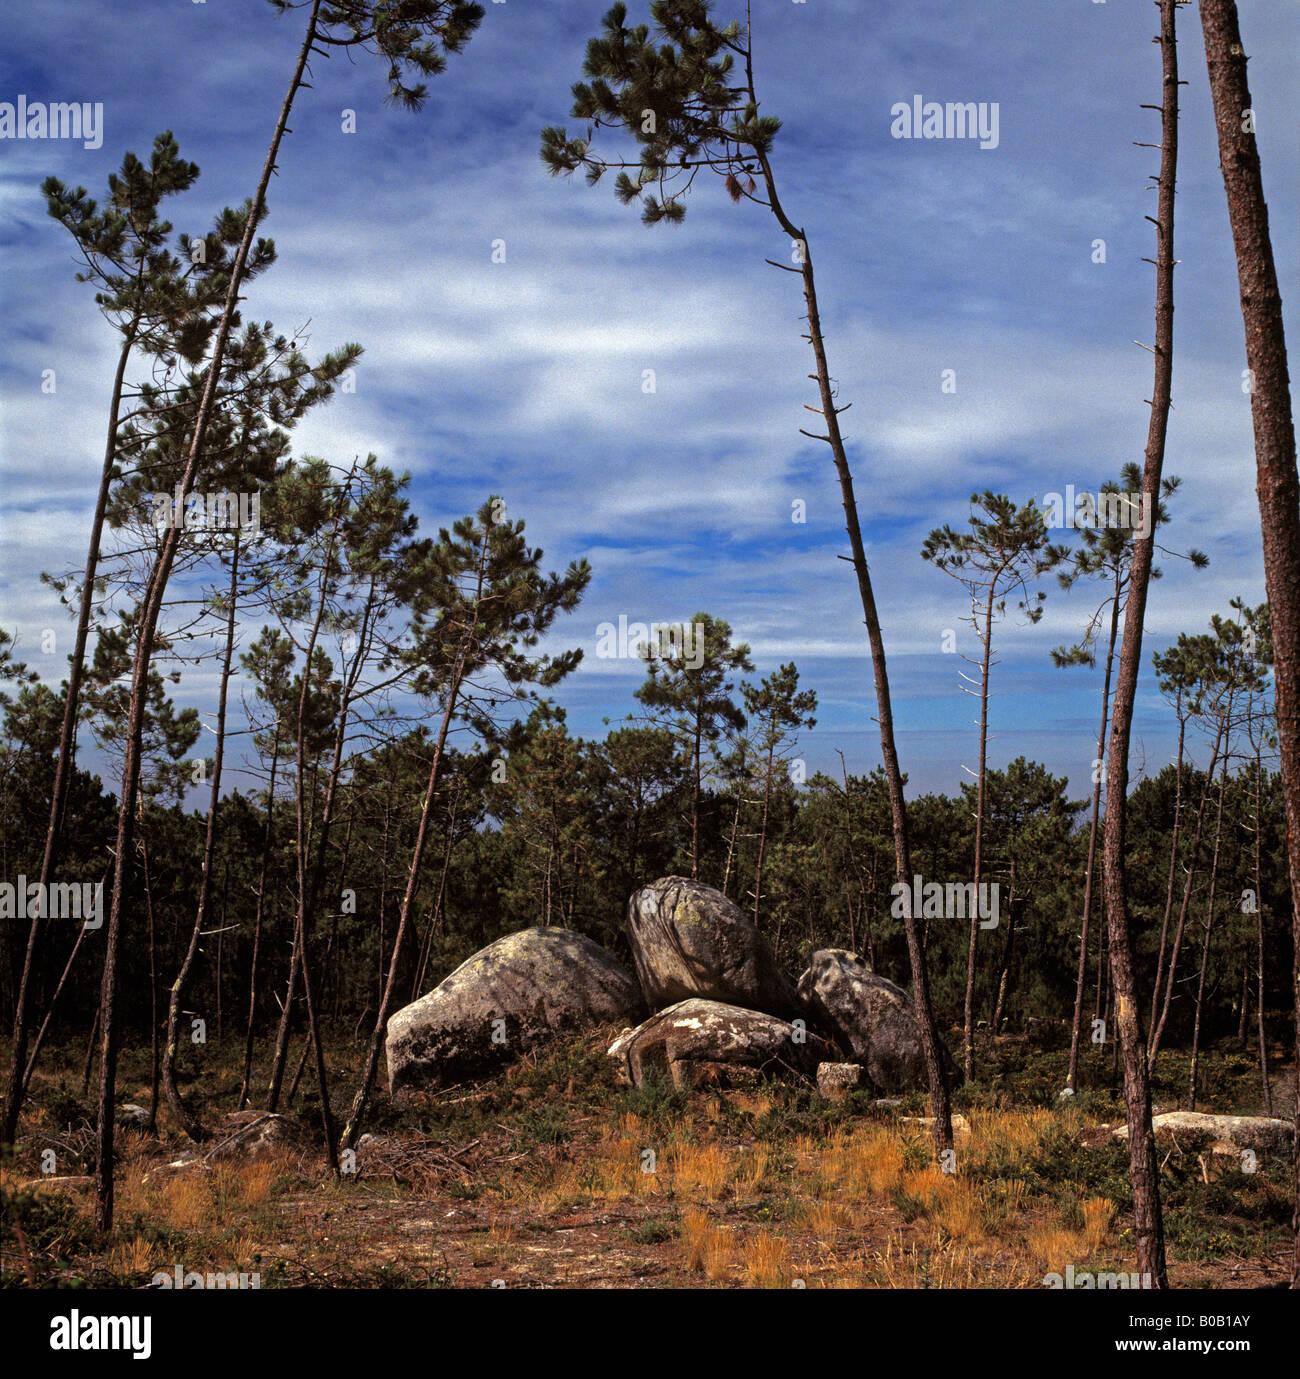 Charming Rocks In Spanish Part - 8: Stock Photo - Rocks U0026 Trees In Spanish Landscape